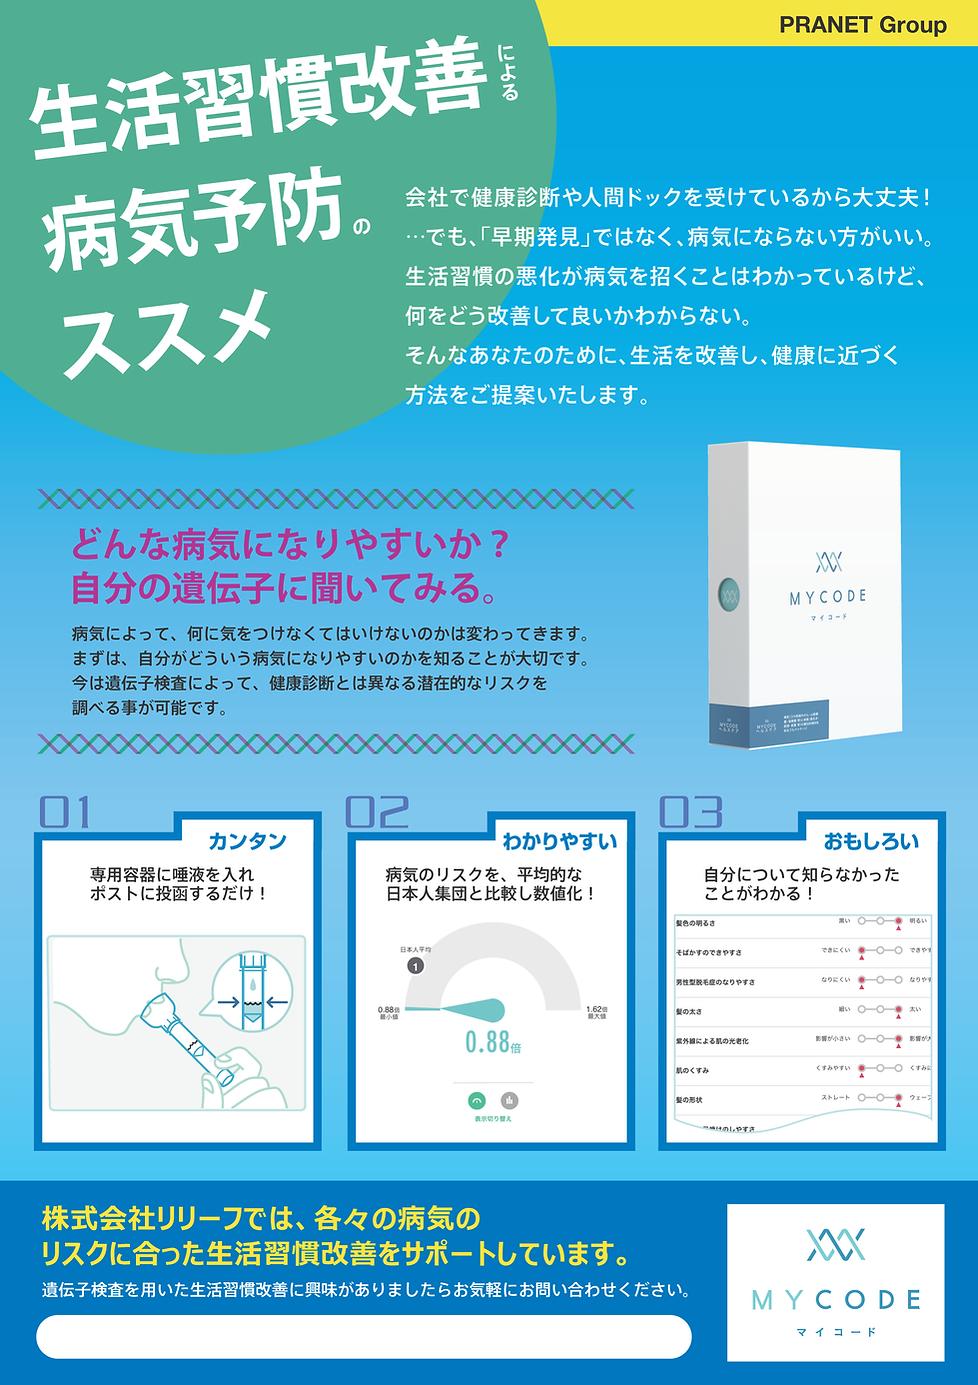 MyCODE_オリジナルちらし-1.png